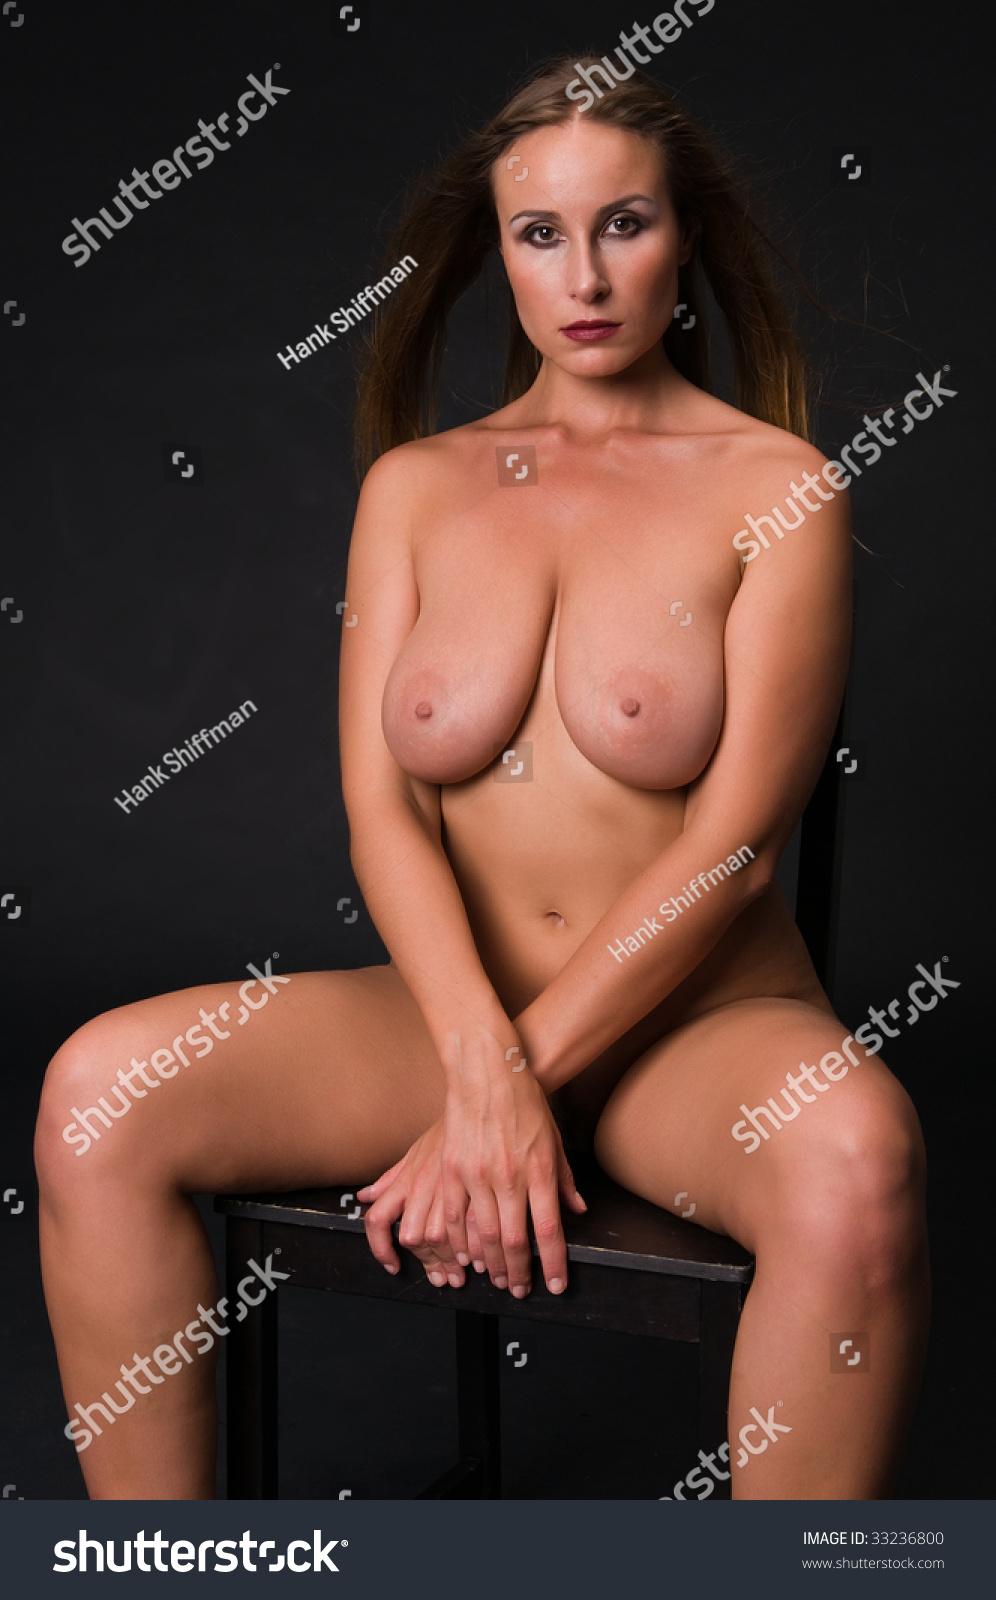 Women posing nude